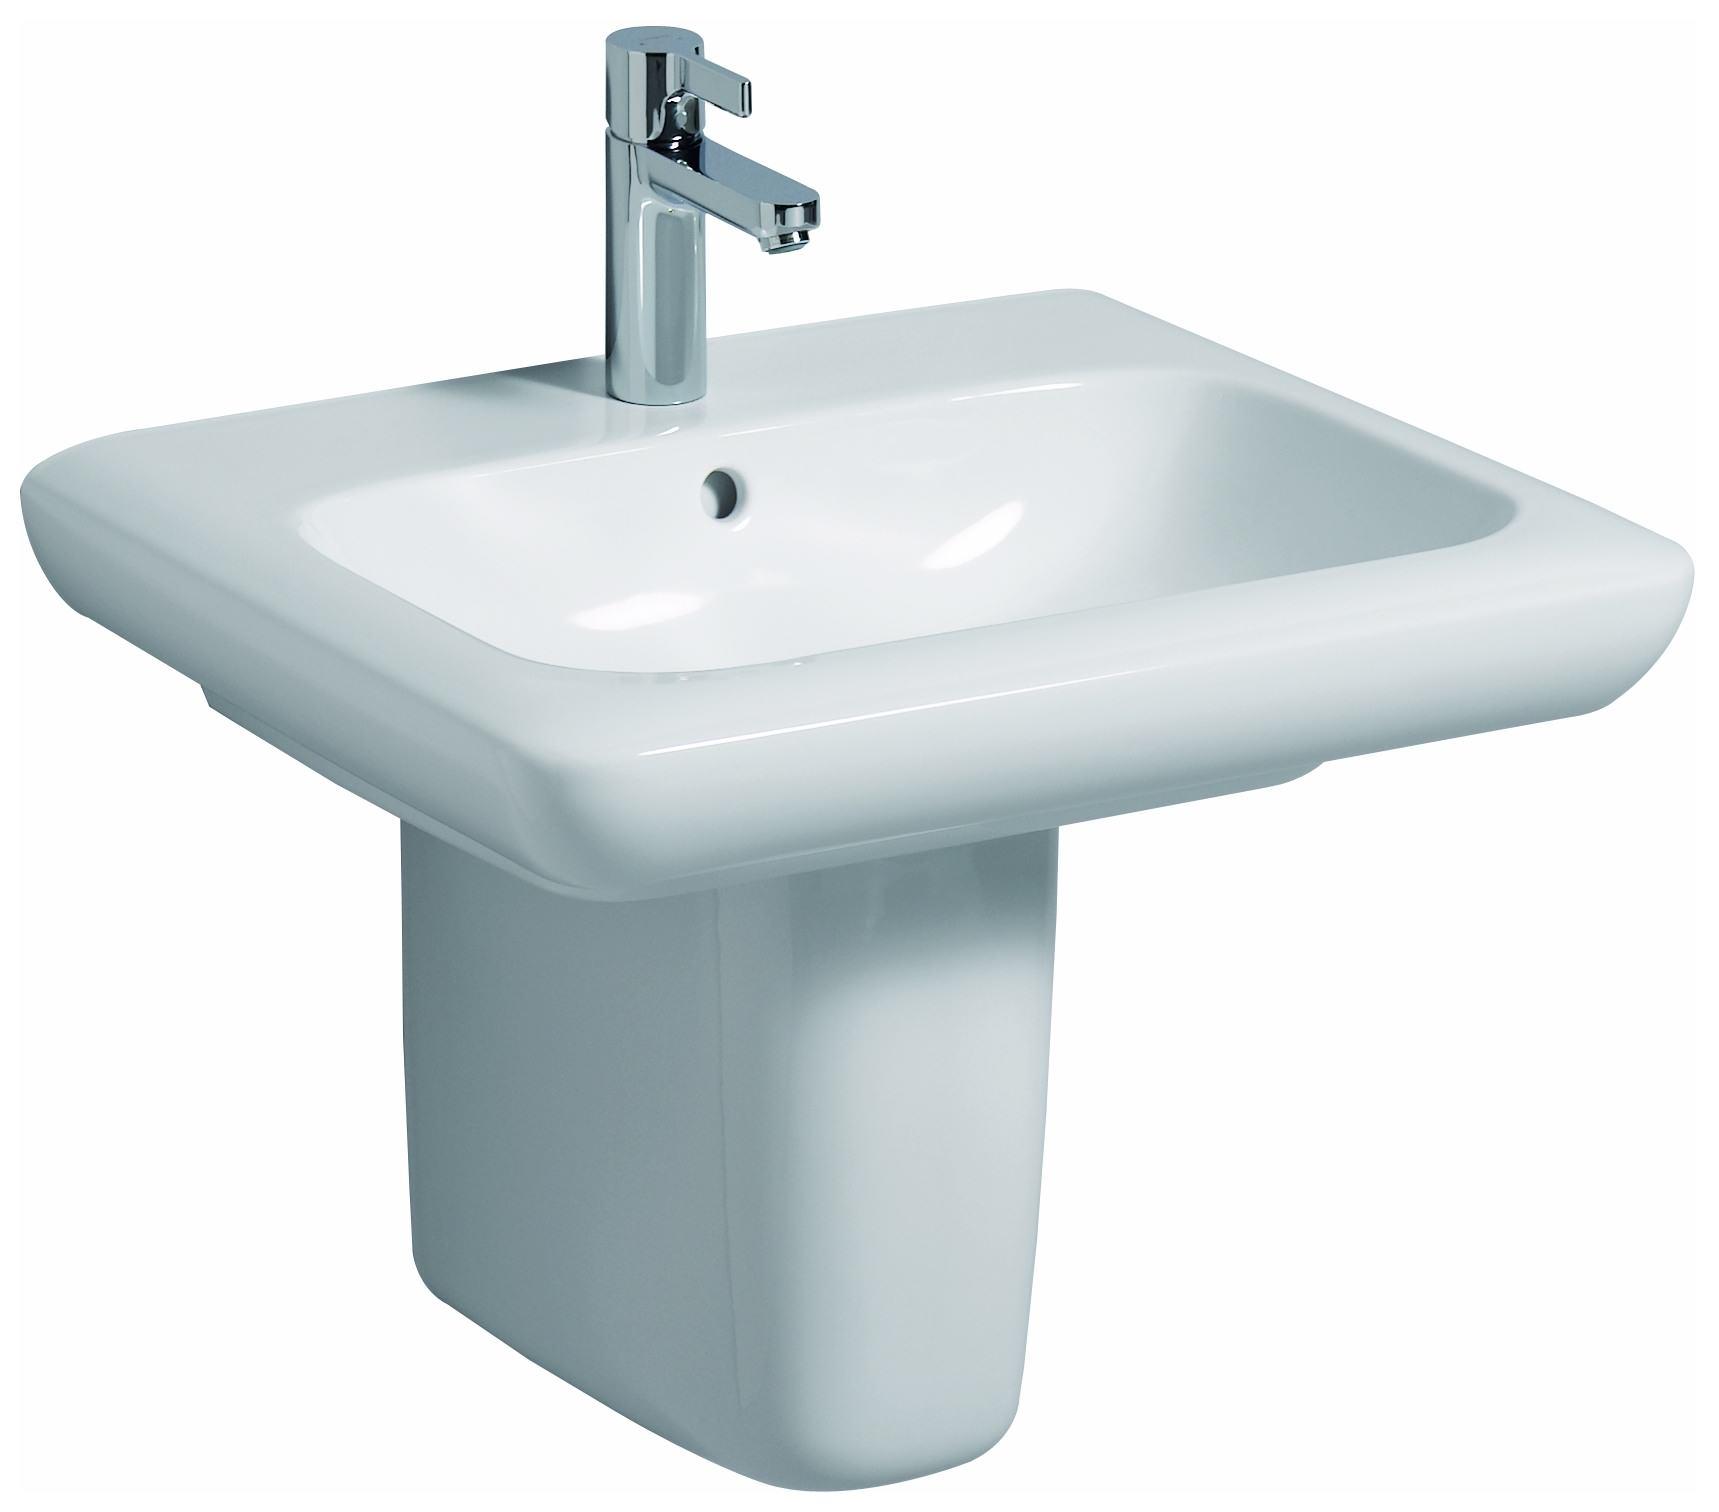 keramag it halbs ule wei alpin keratect 291910600. Black Bedroom Furniture Sets. Home Design Ideas